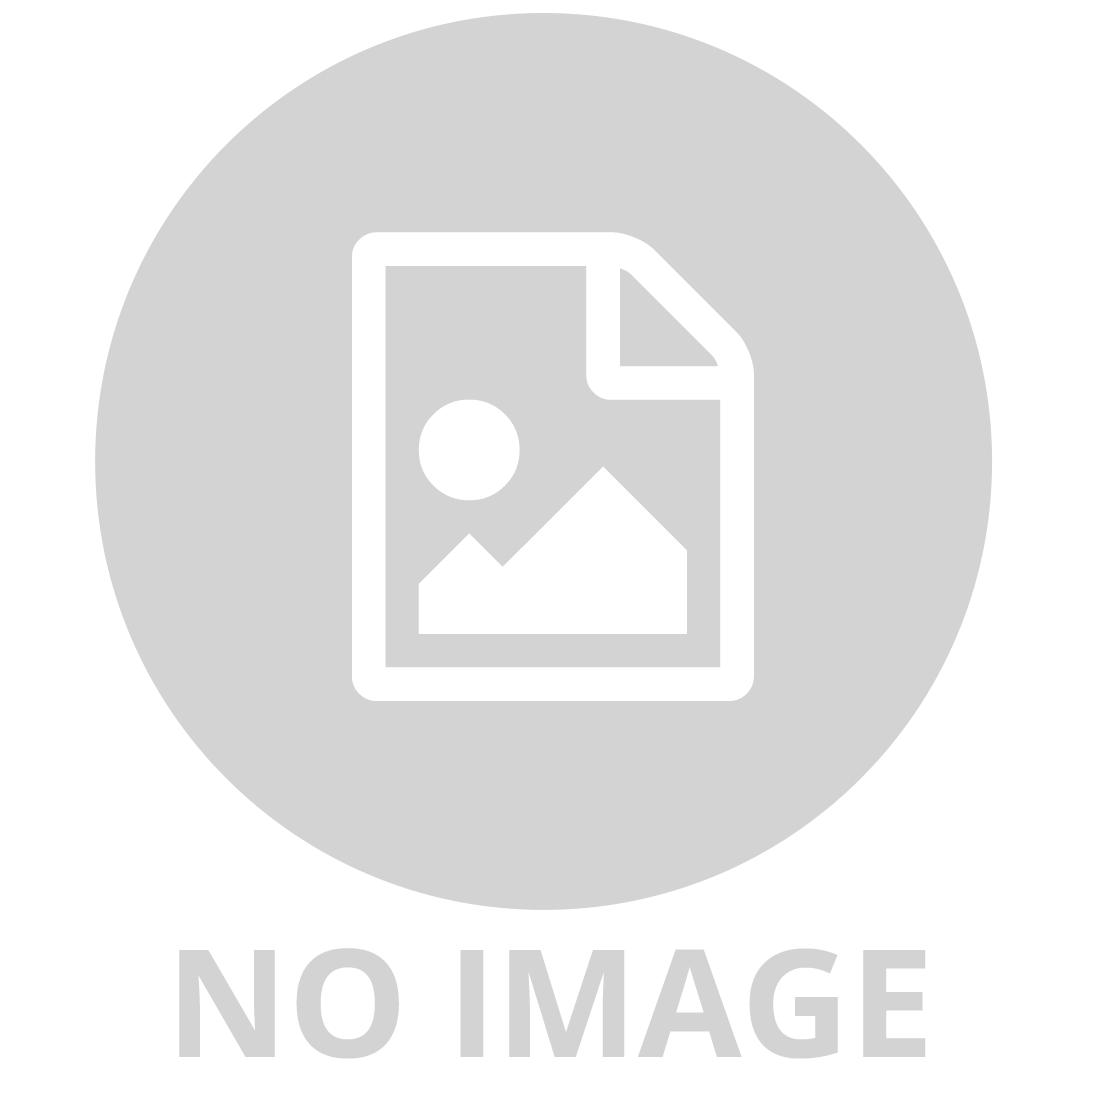 CUDDLEKINS GREAT HORNED OWL